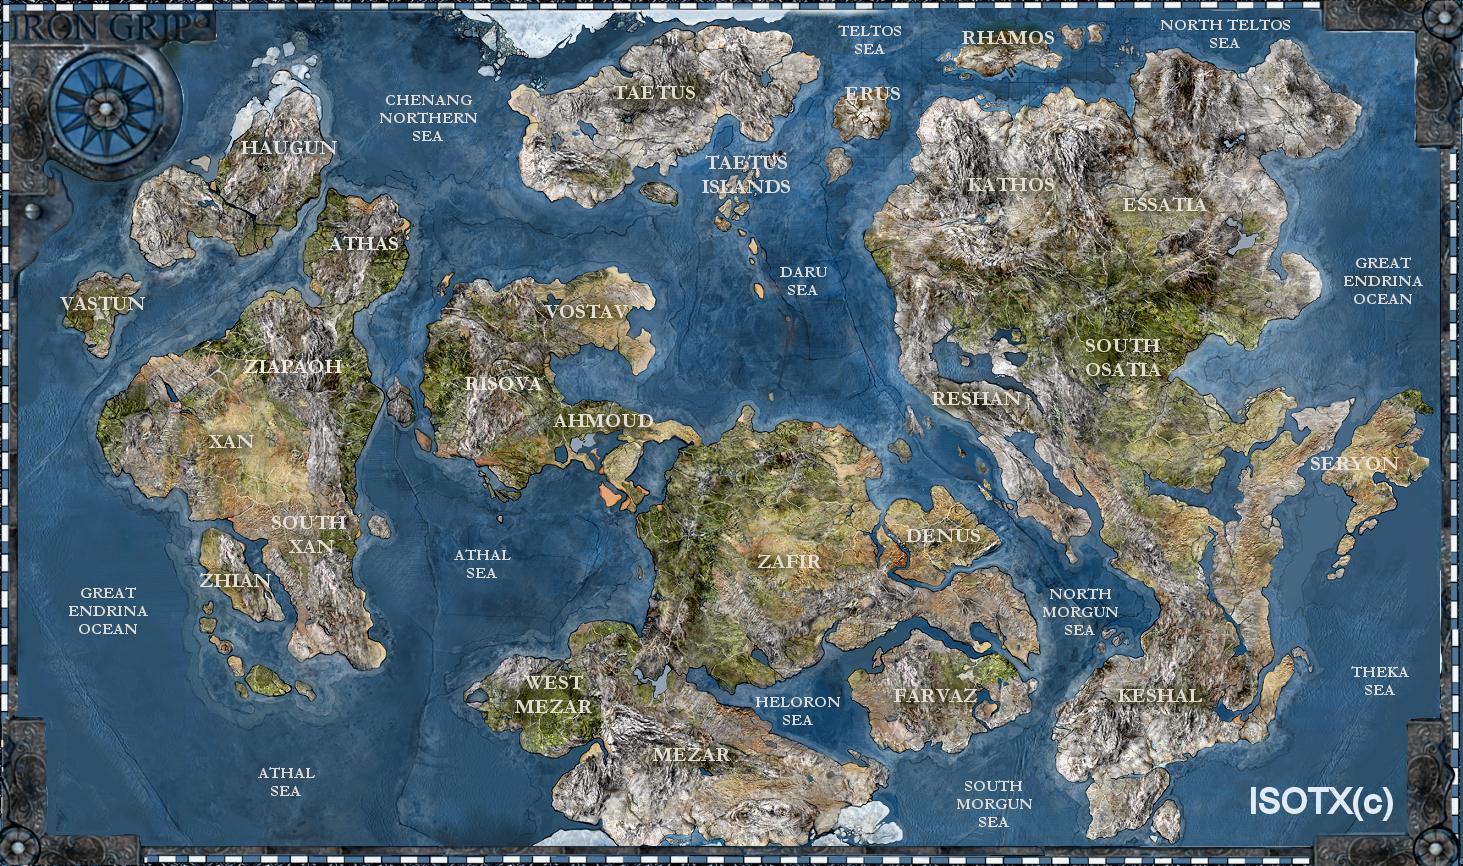 Iron Grip World Map by Monkey Paw world map Pinterest Iron Fantasy ma